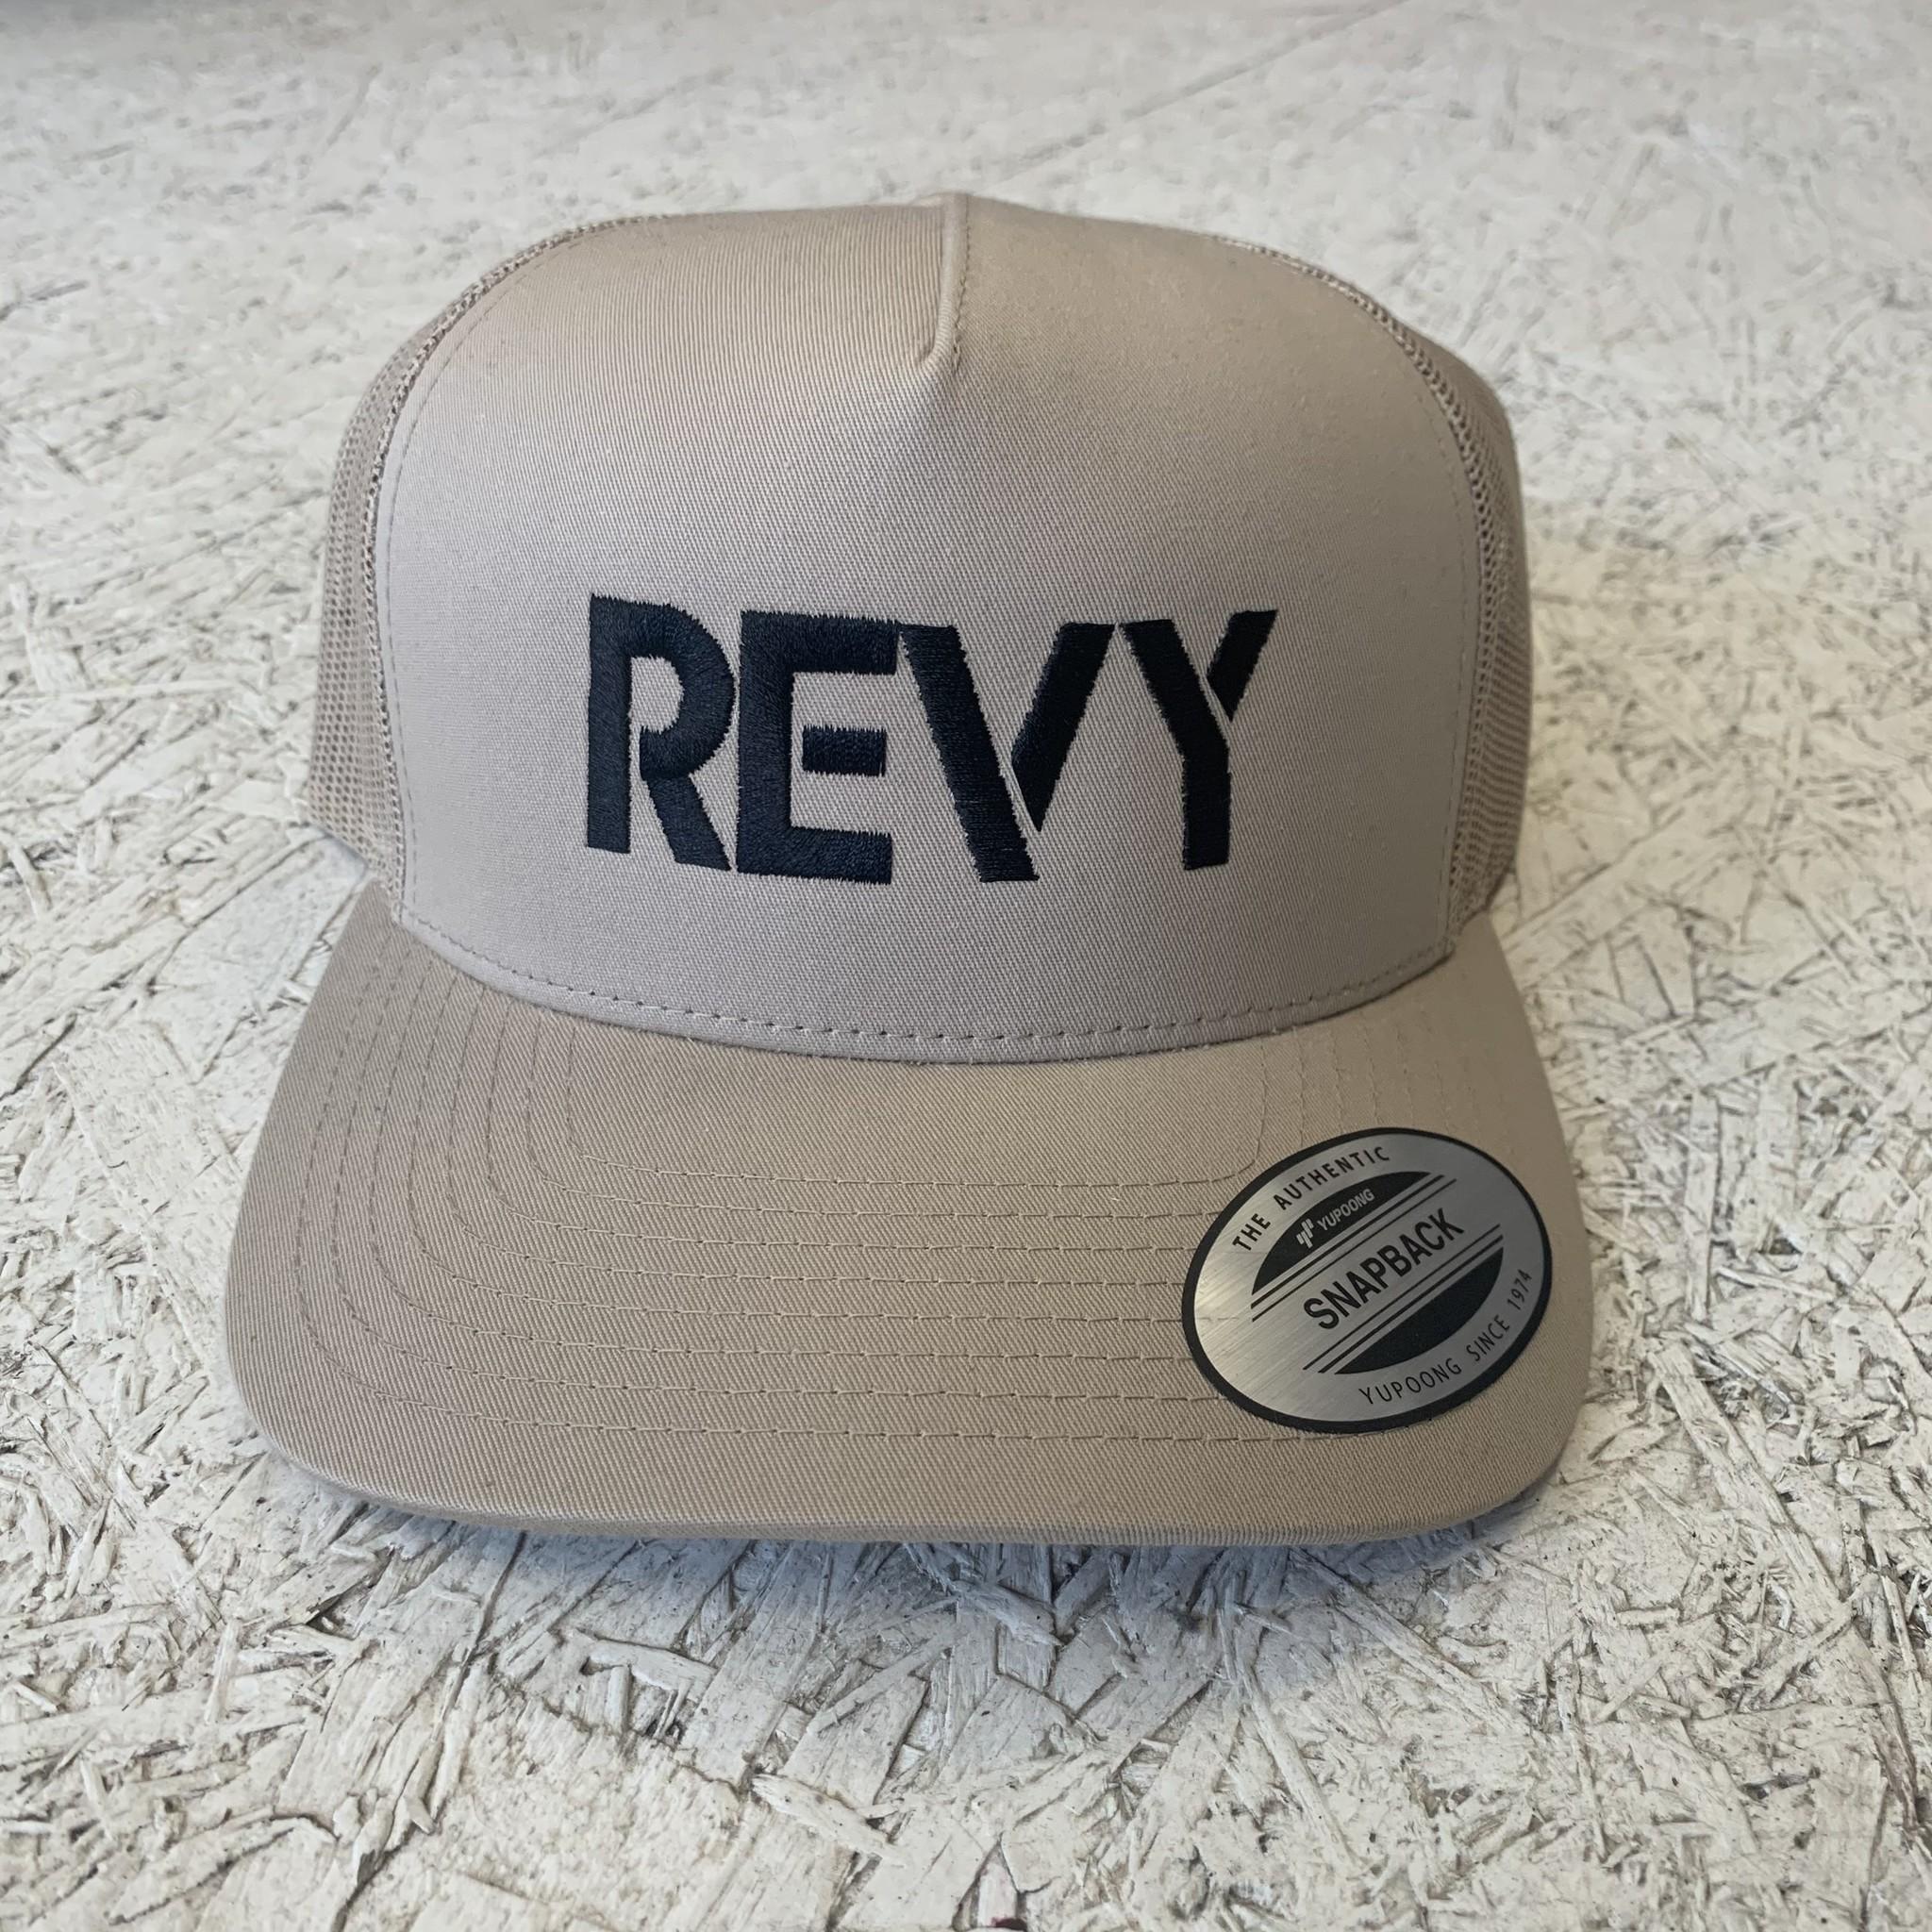 Revelstoke Trading Post Revelstoke - REVY Stamp Curve Brim - Khaki